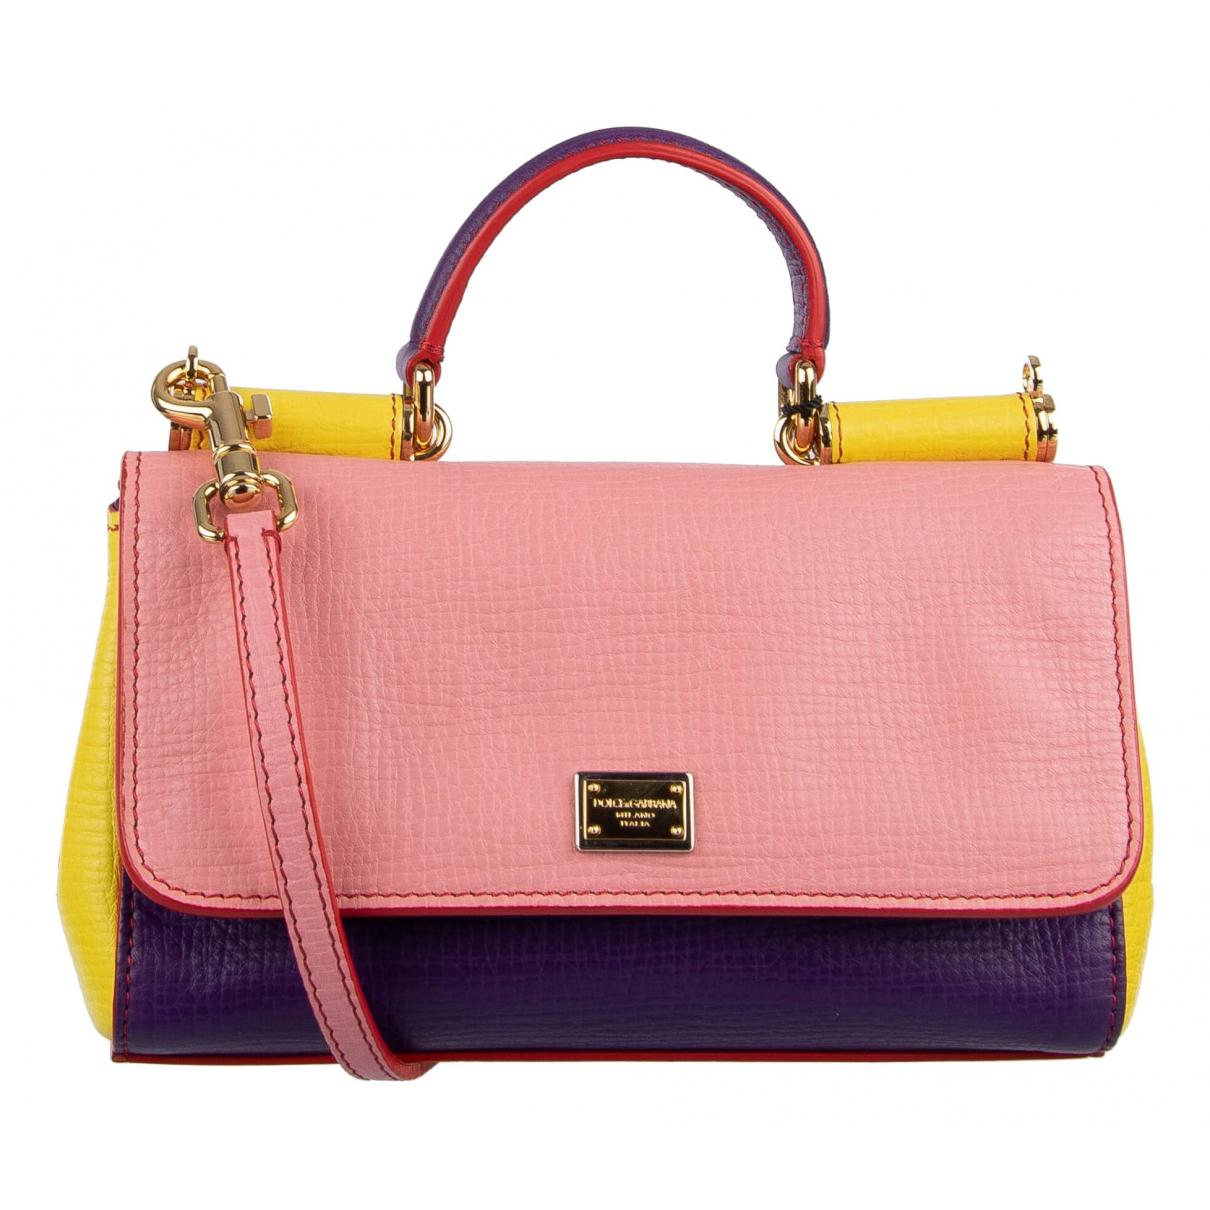 Dolce & Gabbana Sicily Pink Leather handbag for Women \N